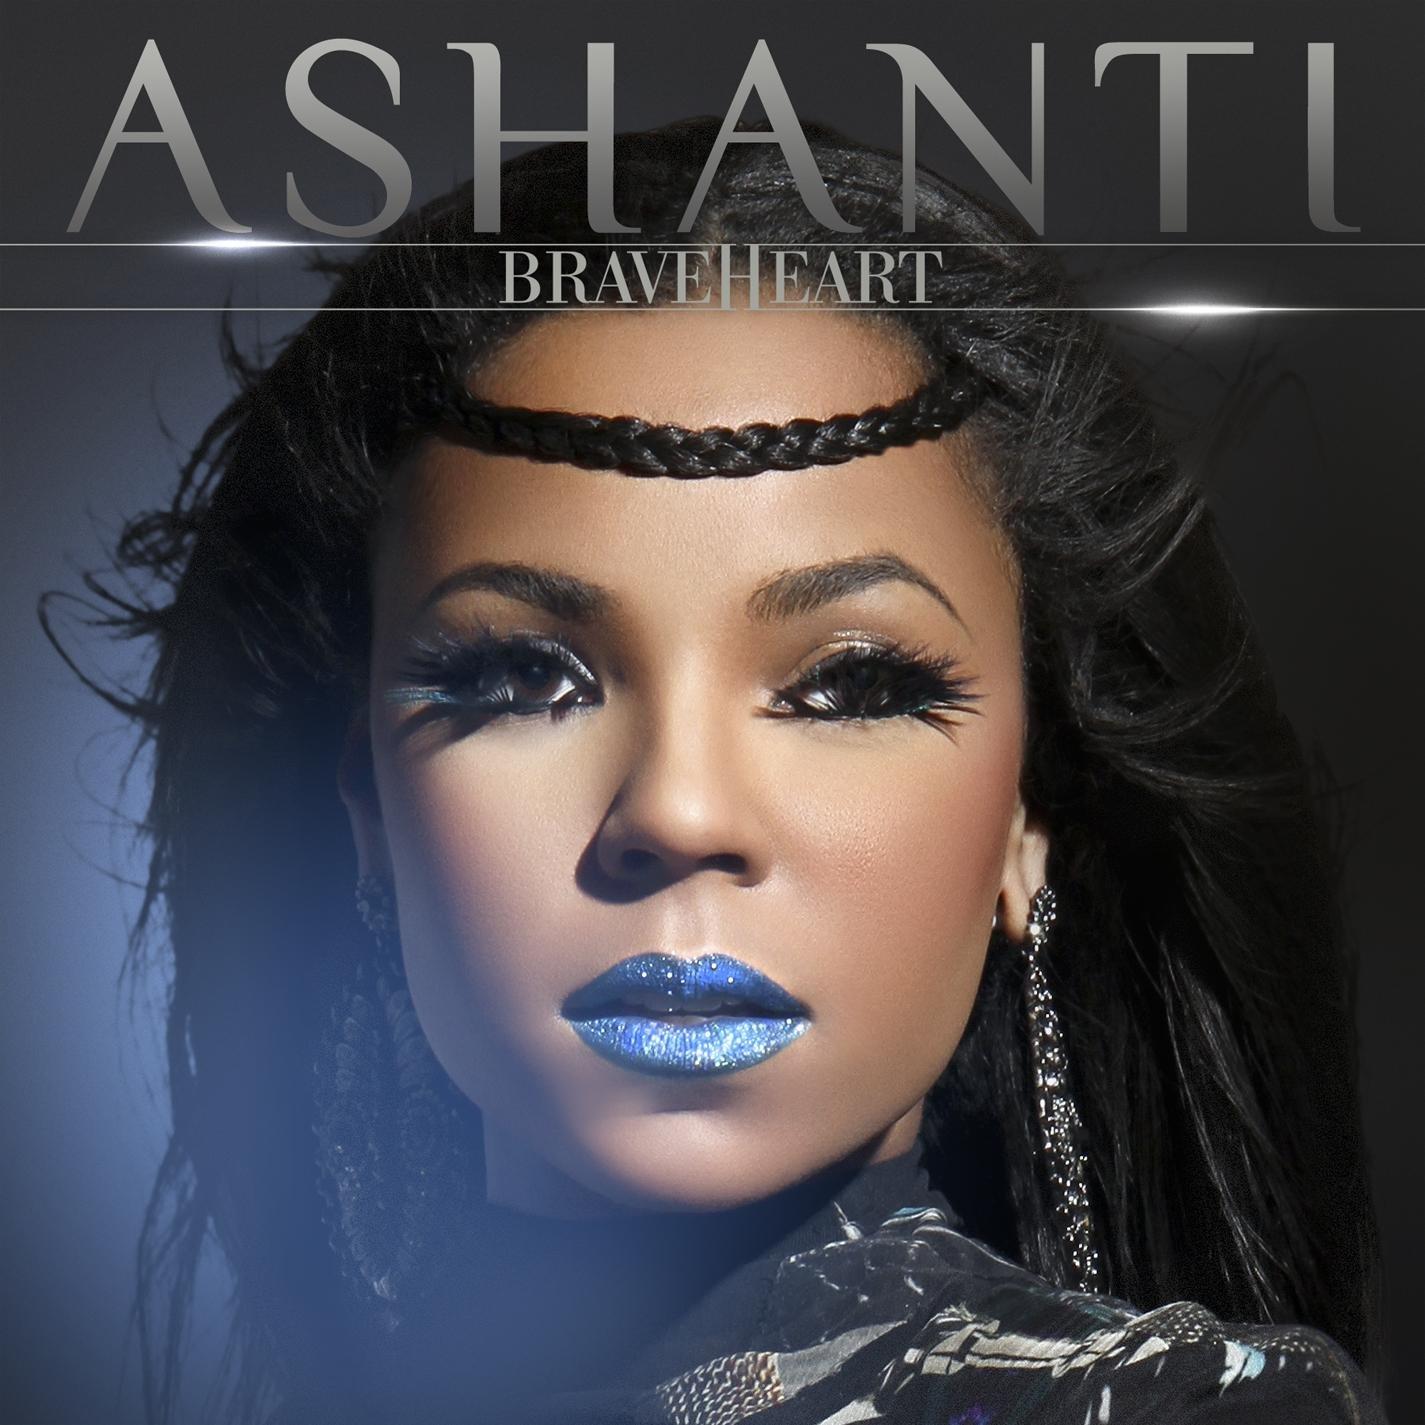 Ashanti's